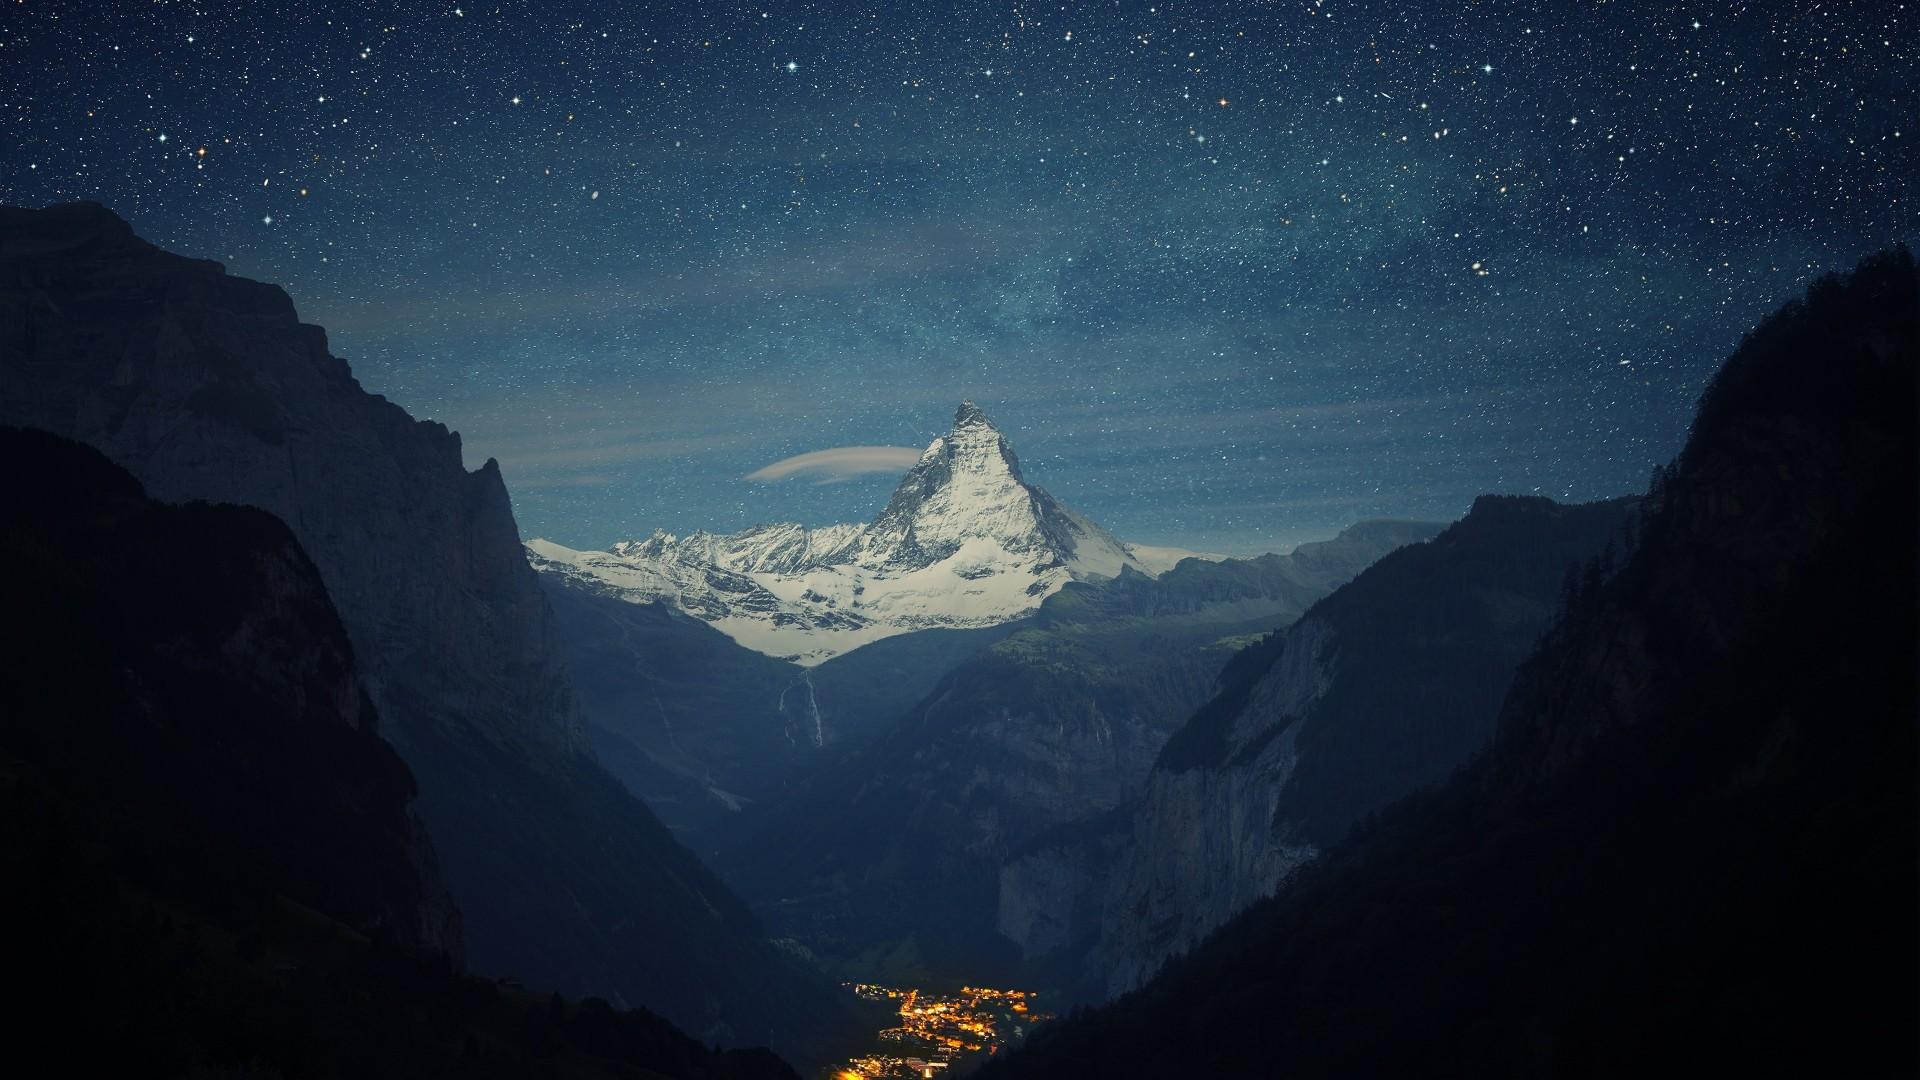 HD Mountain Landscape Wallpapers 60344